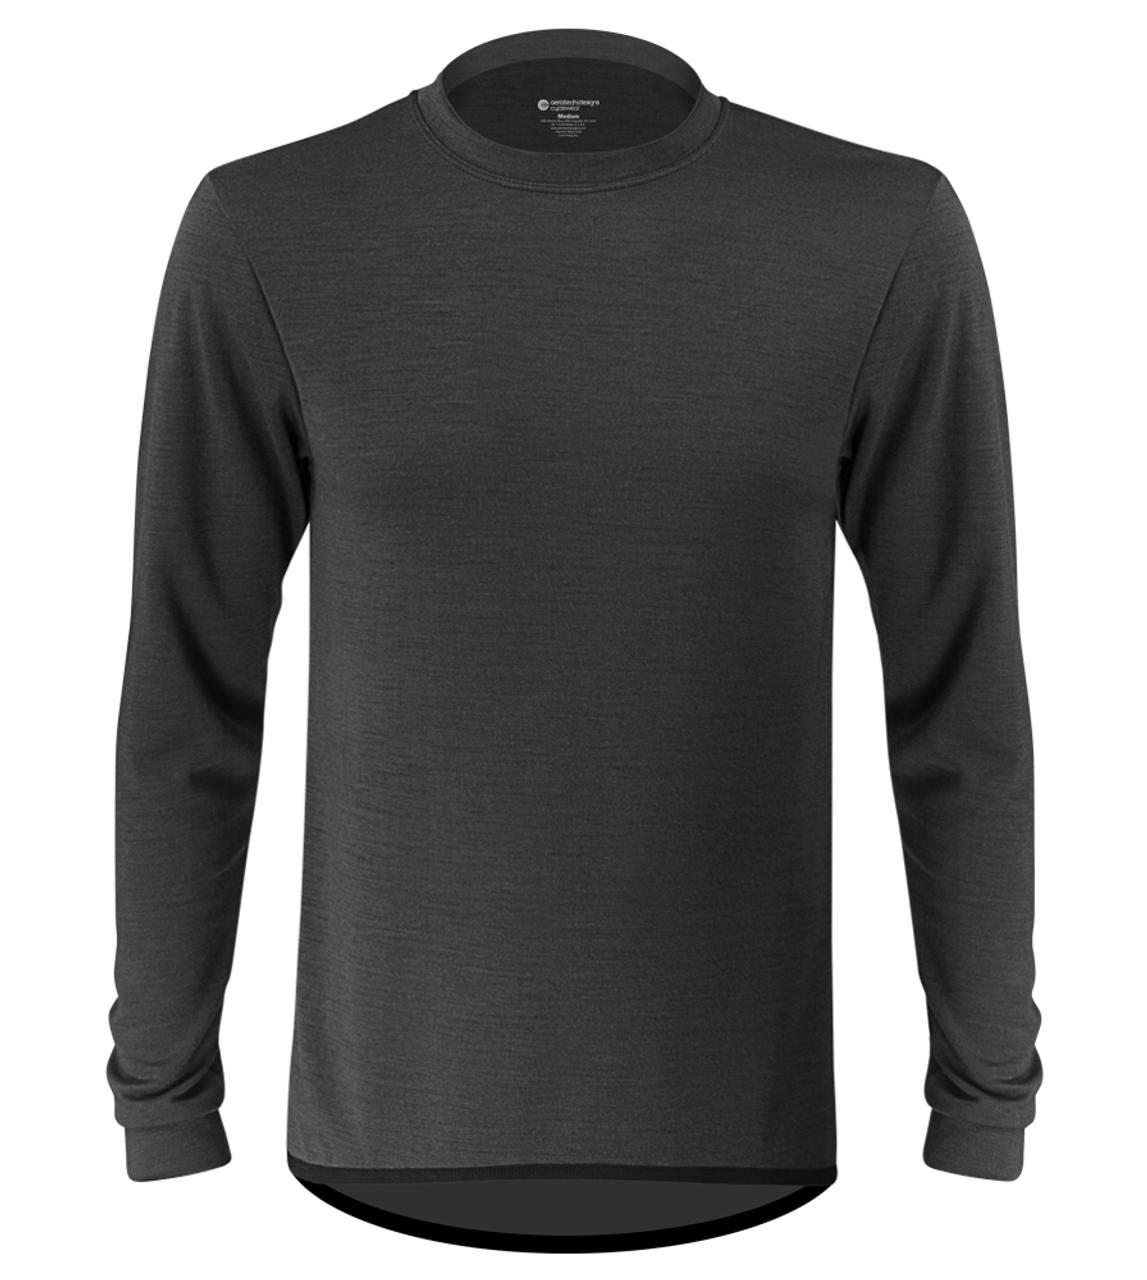 7dc1dead5c0aa Aero Tech Men's Merino Wool Base Layer in Charcoal Front View